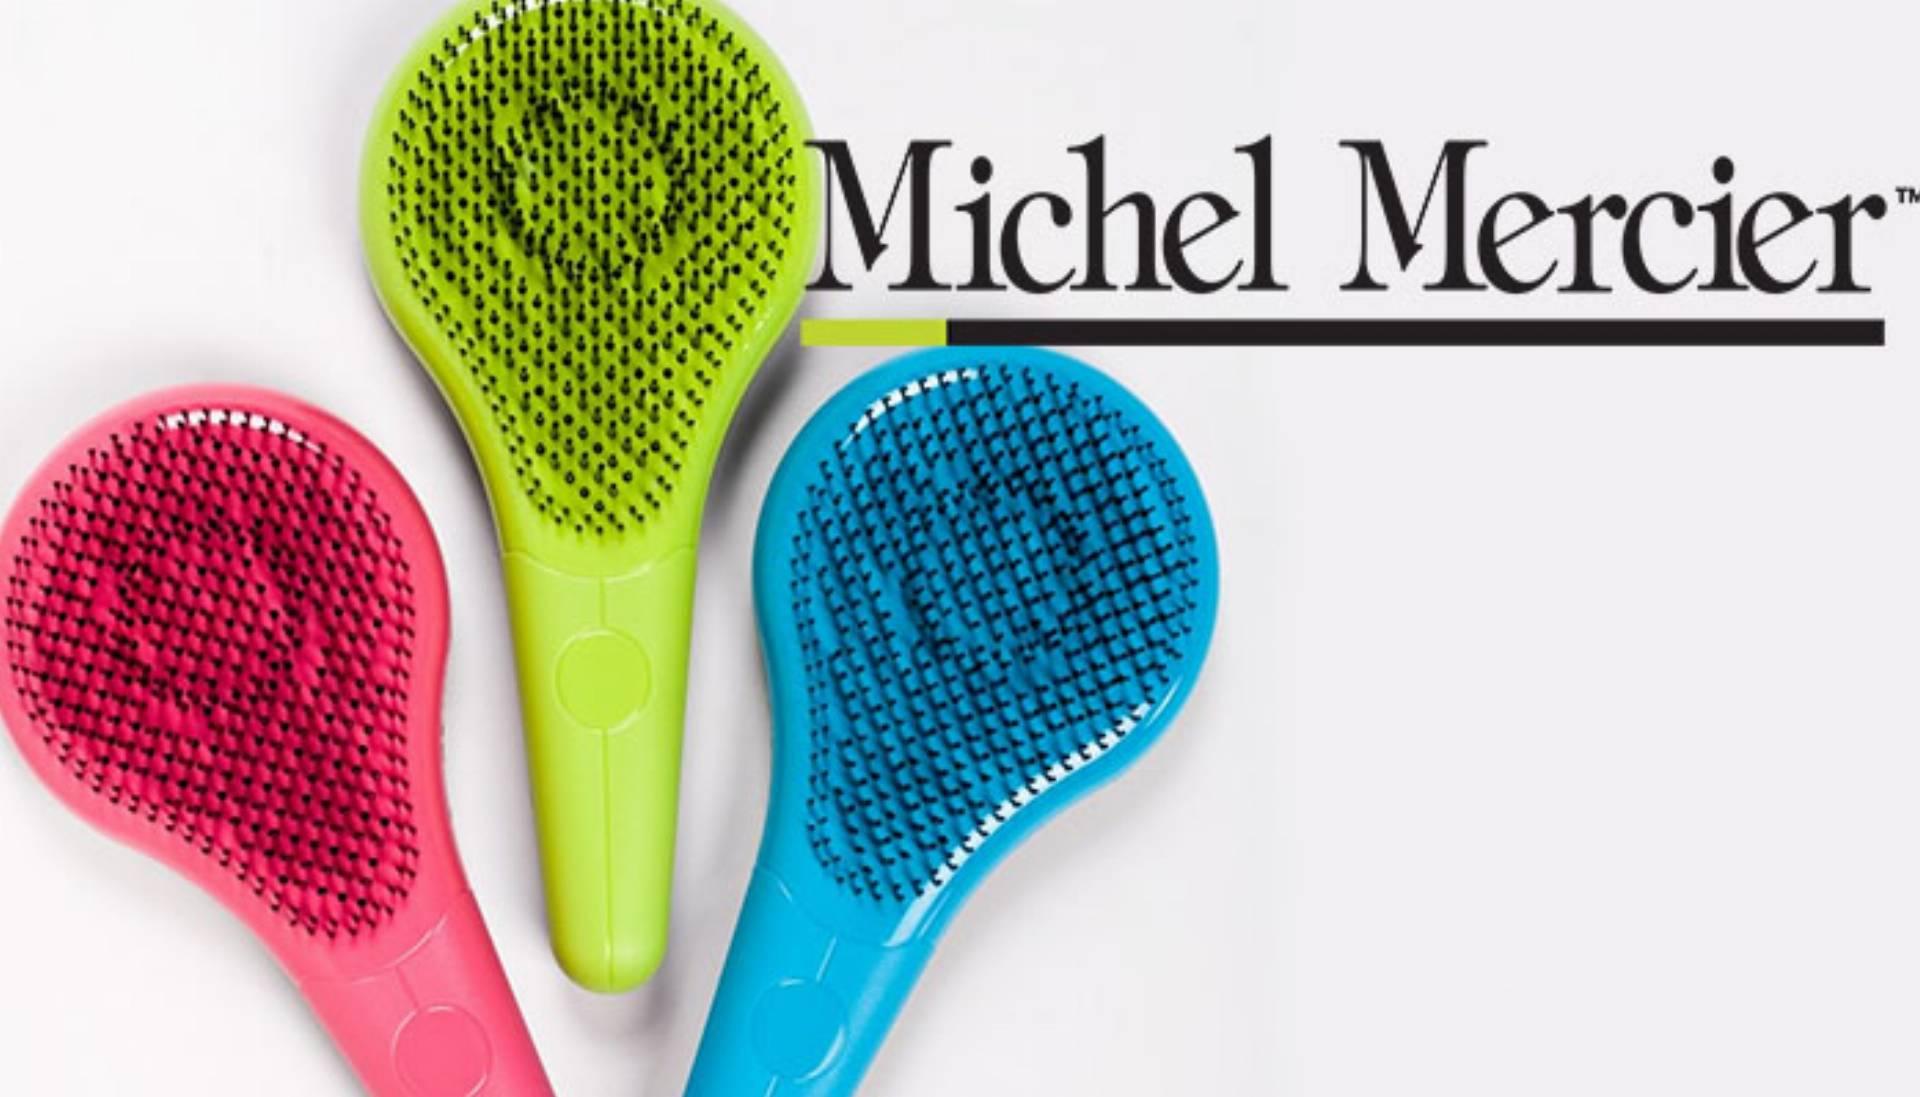 szczotki Michel Mercier